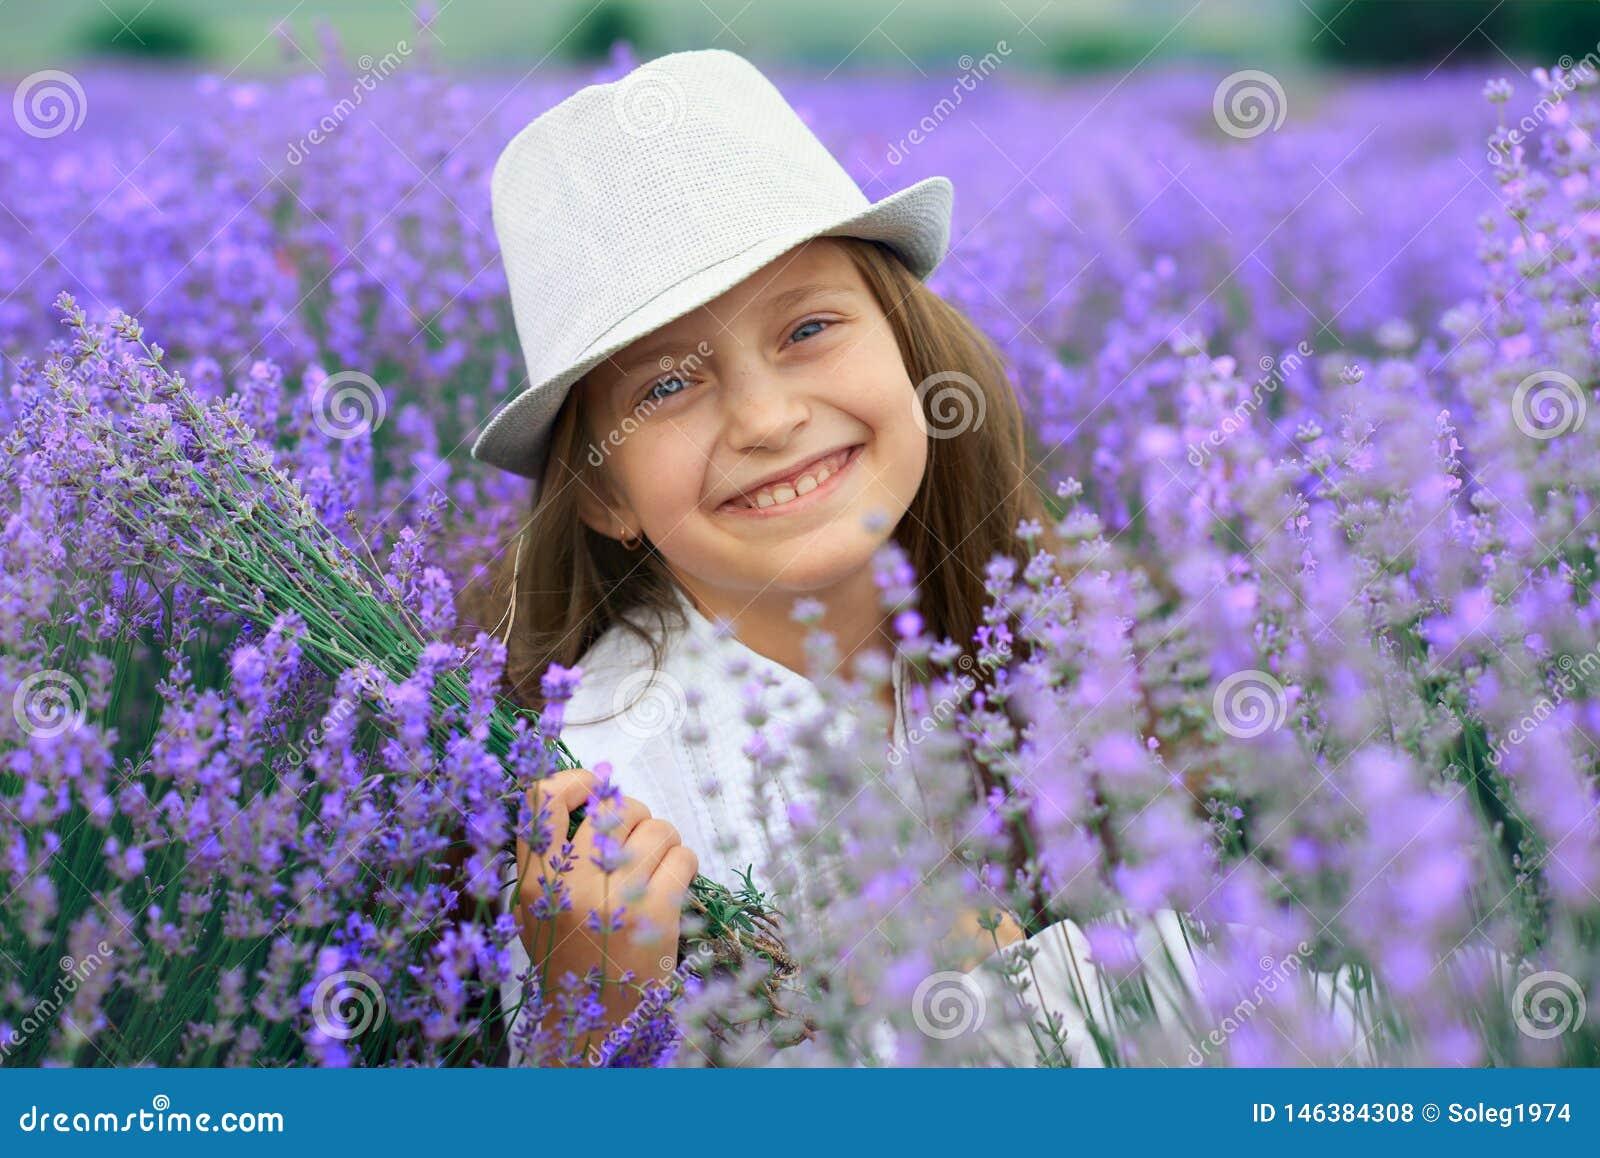 Girl child is in the lavender flower field, beautiful summer landscape